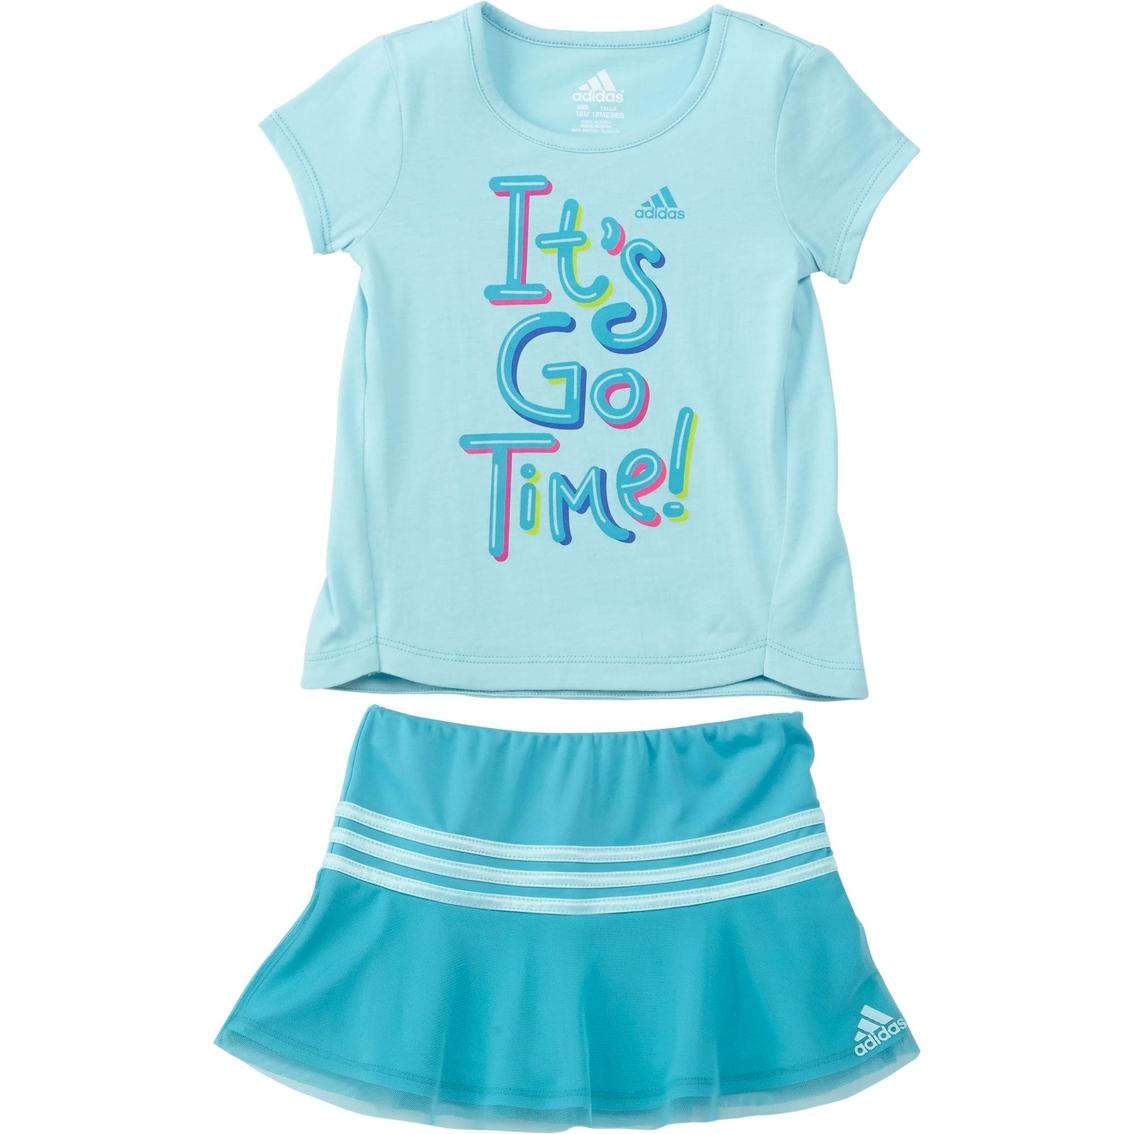 adidas Baby Girls Skort Set